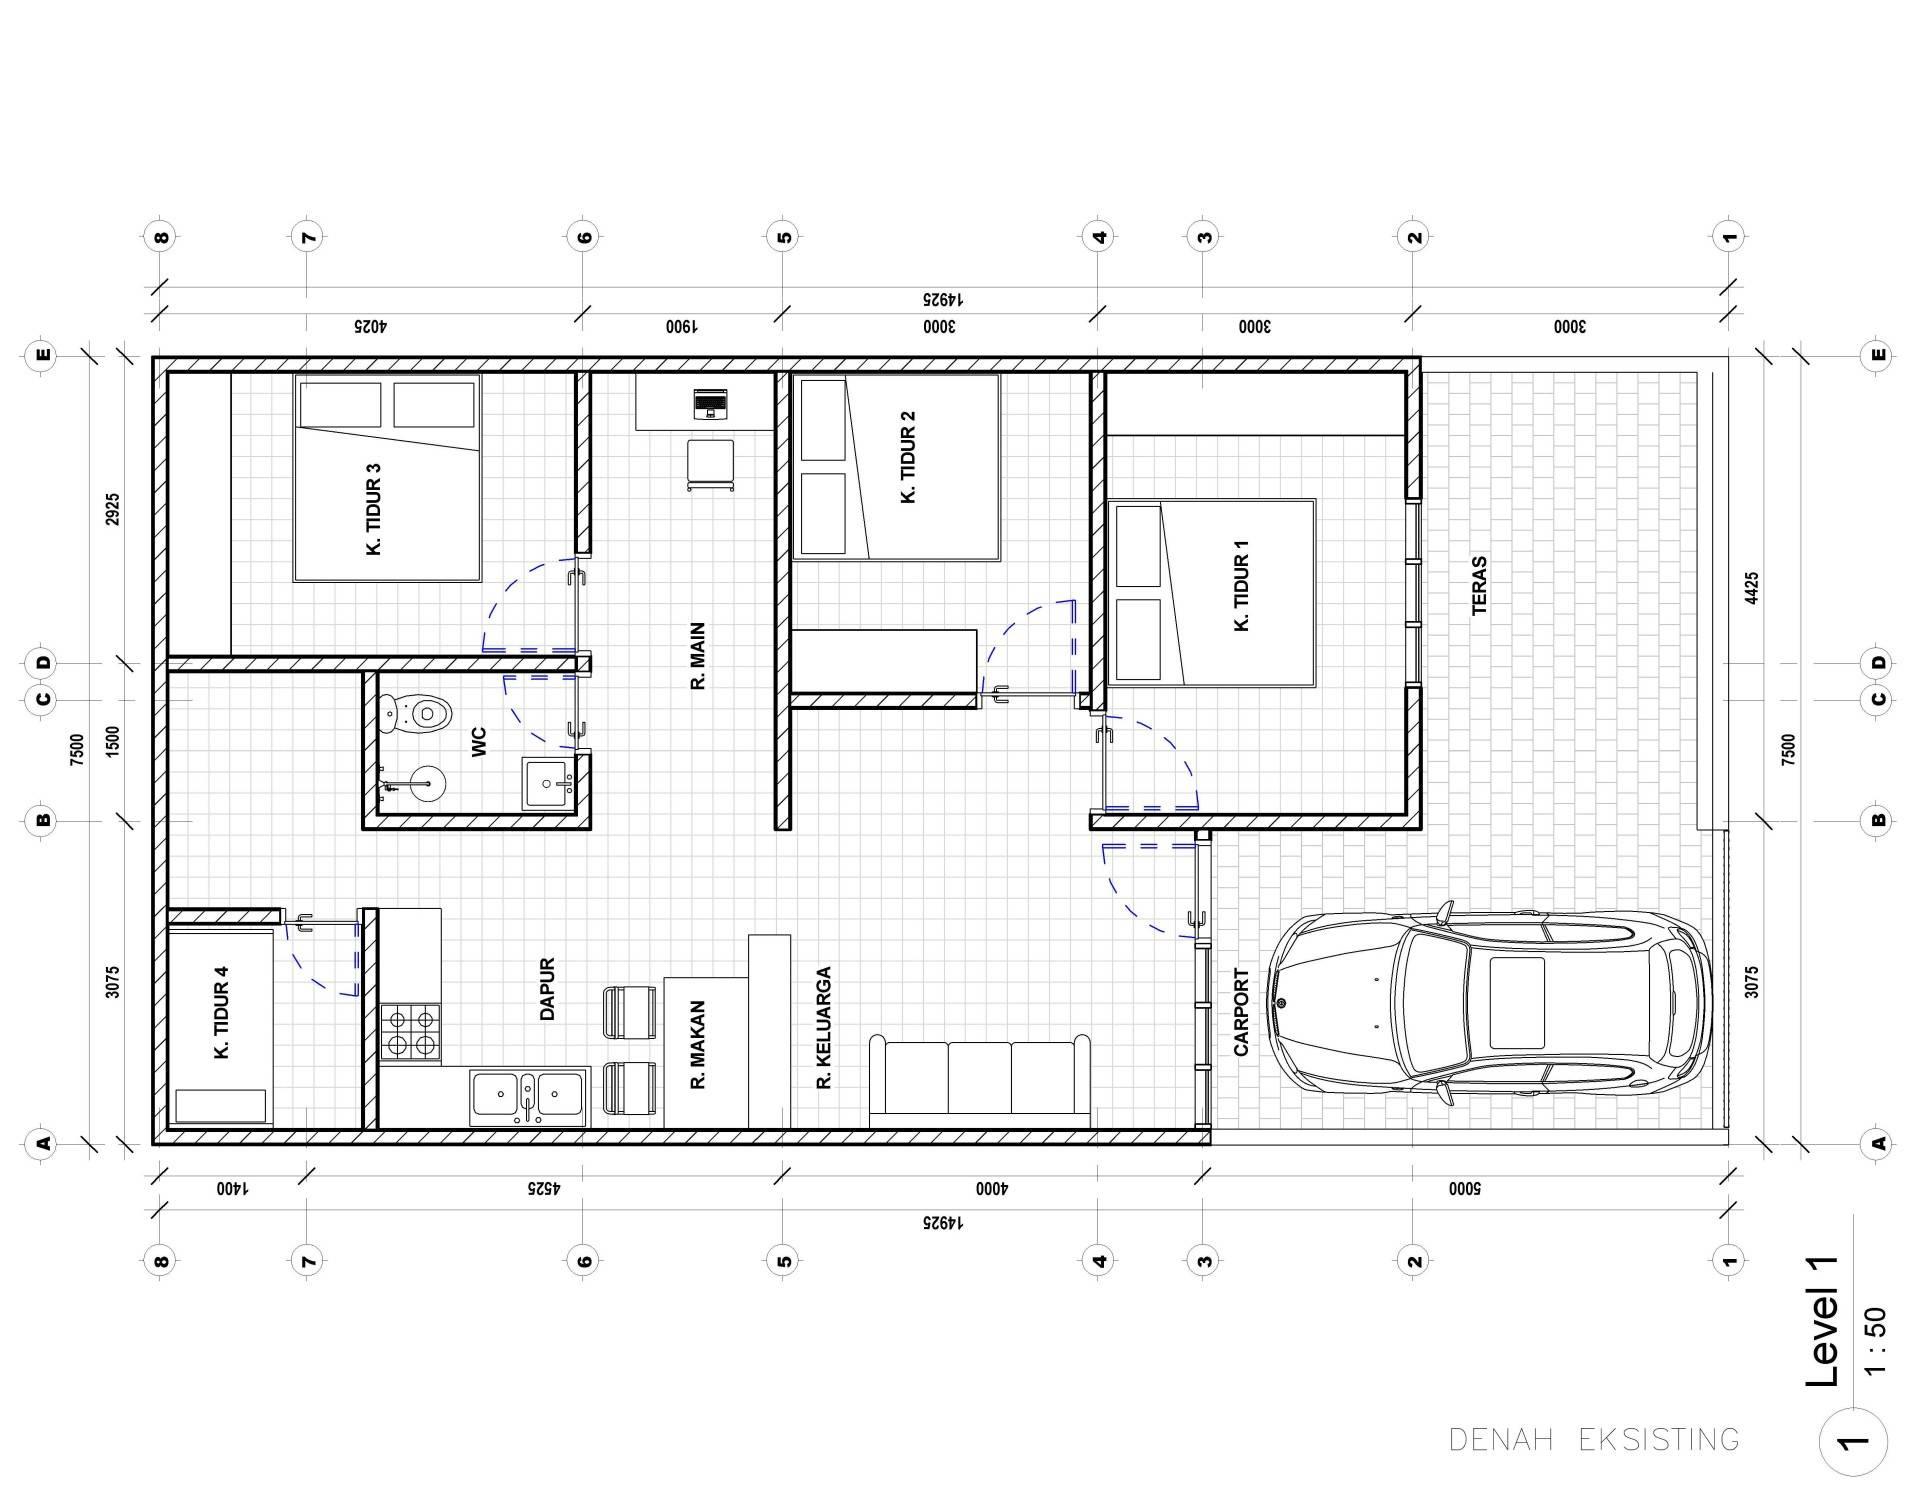 Nico Gowindra Ss-House Bsd - Tangerang Bsd - Tangerang Eksisting Kontemporer,modern  3794